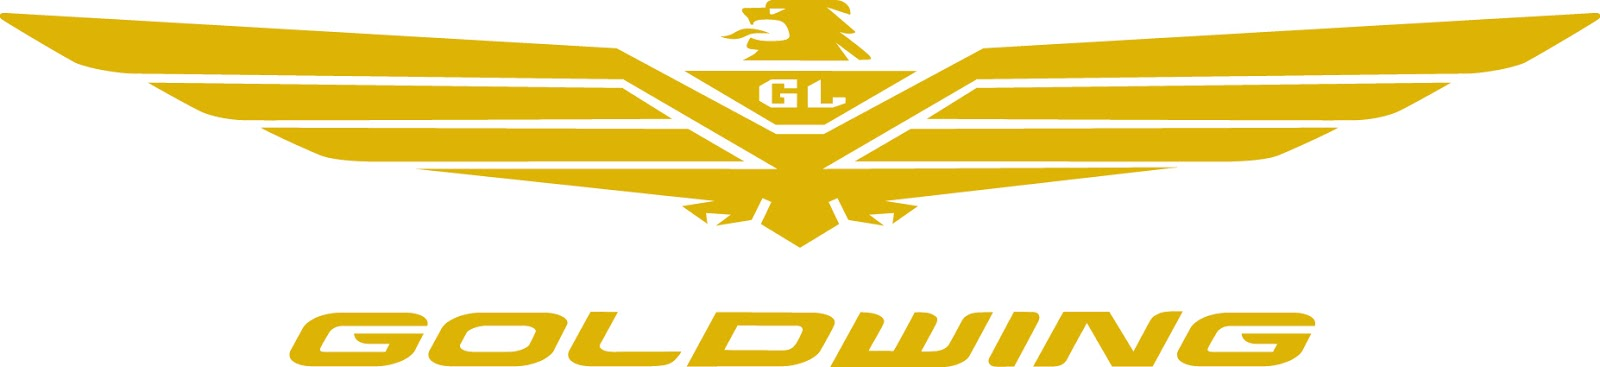 Goldwing logo machine embroidery designs